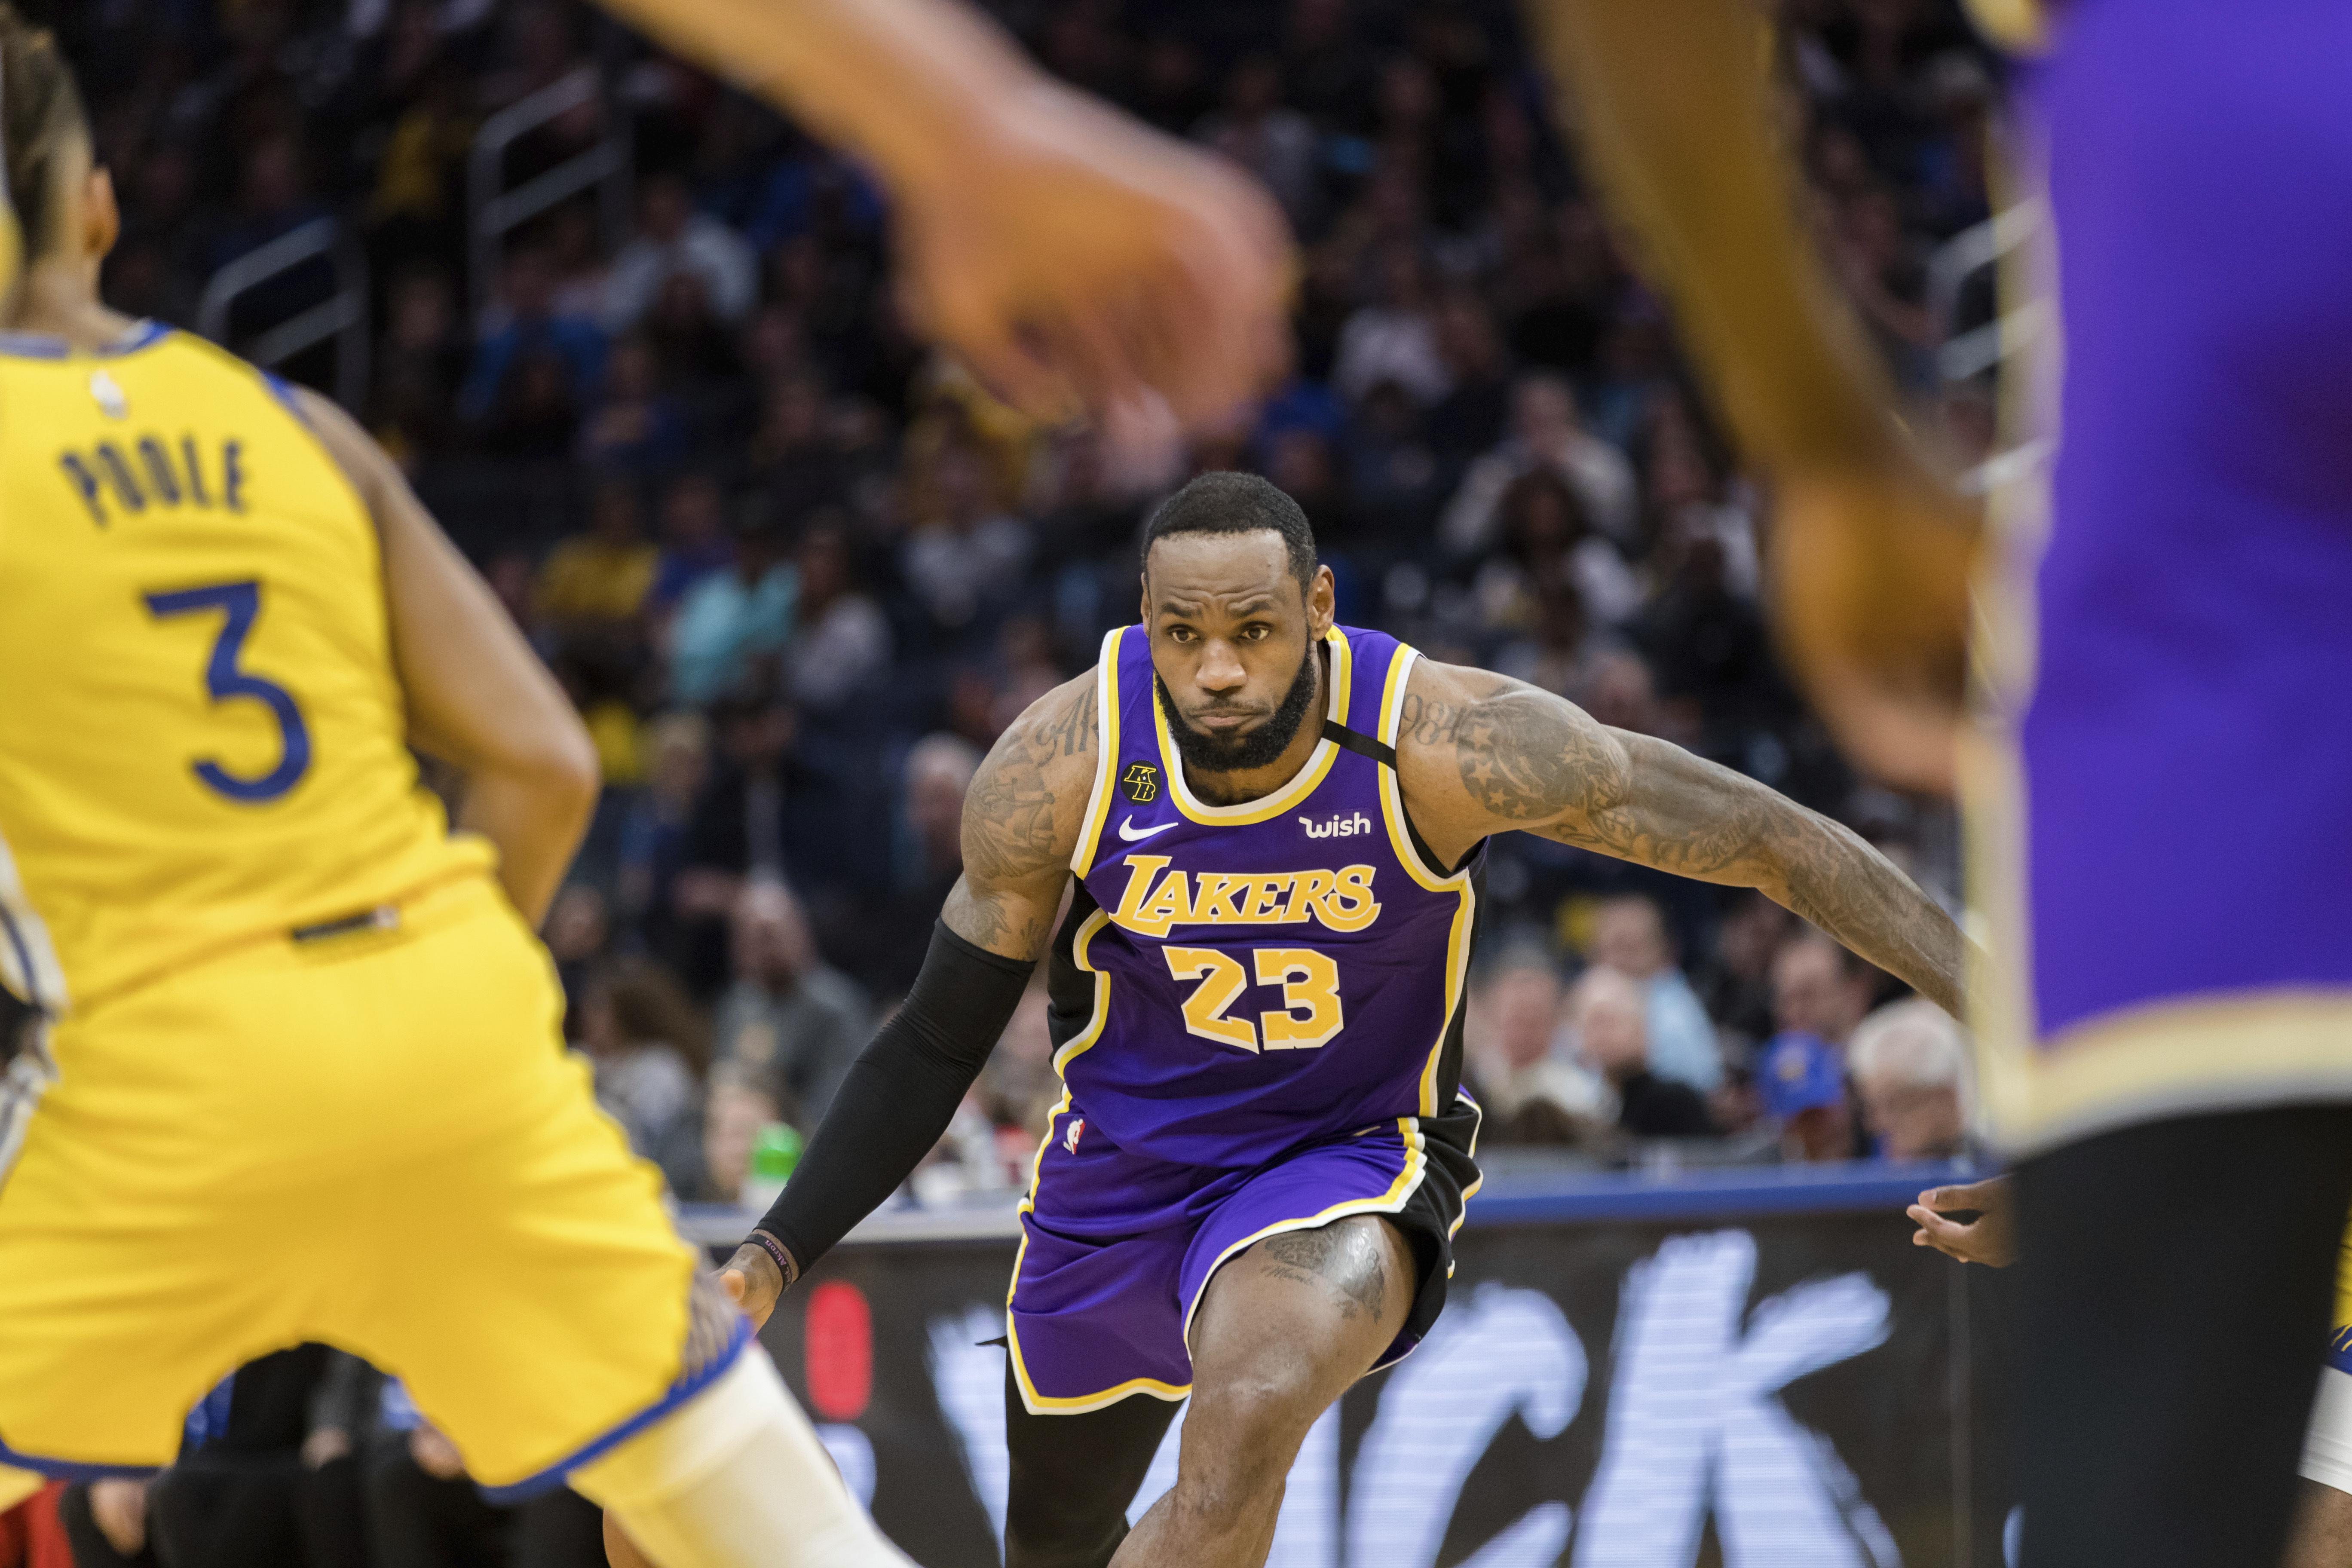 LeBron James scores 22 points, Lakers beat Warriors 125-120